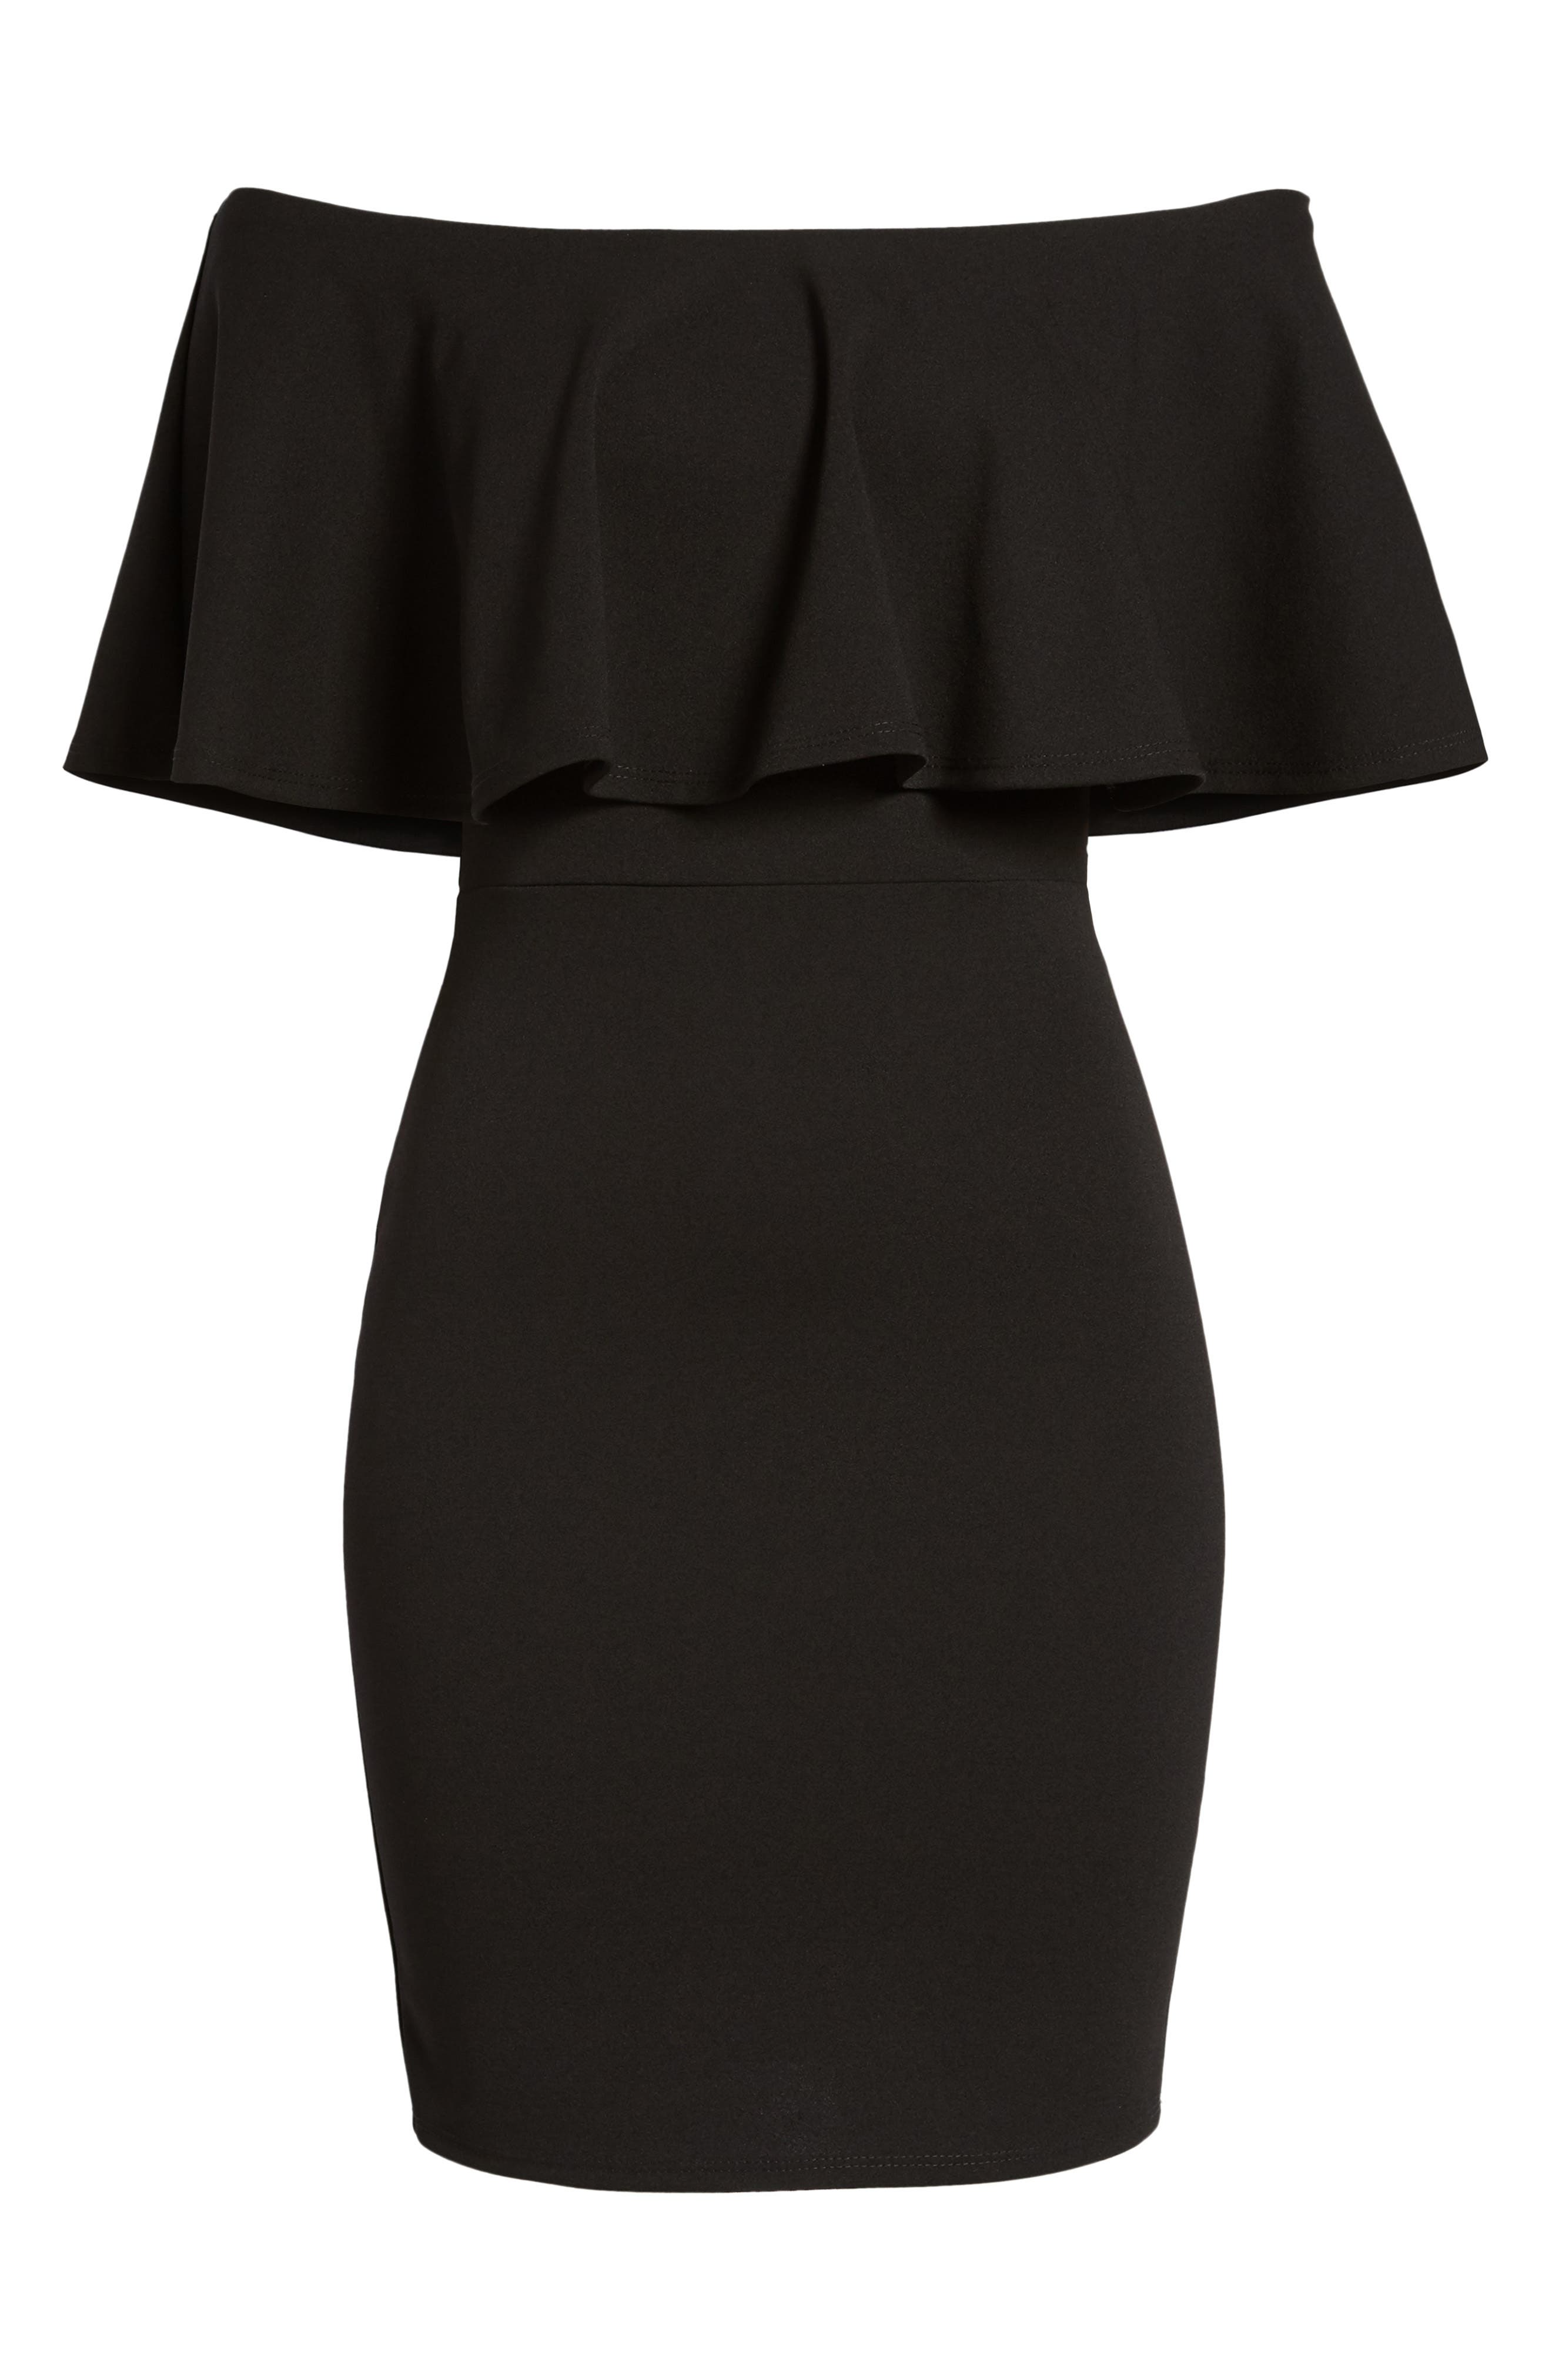 SOPRANO, Ruffle Off the Shoulder Body-Con Dress, Alternate thumbnail 7, color, 001